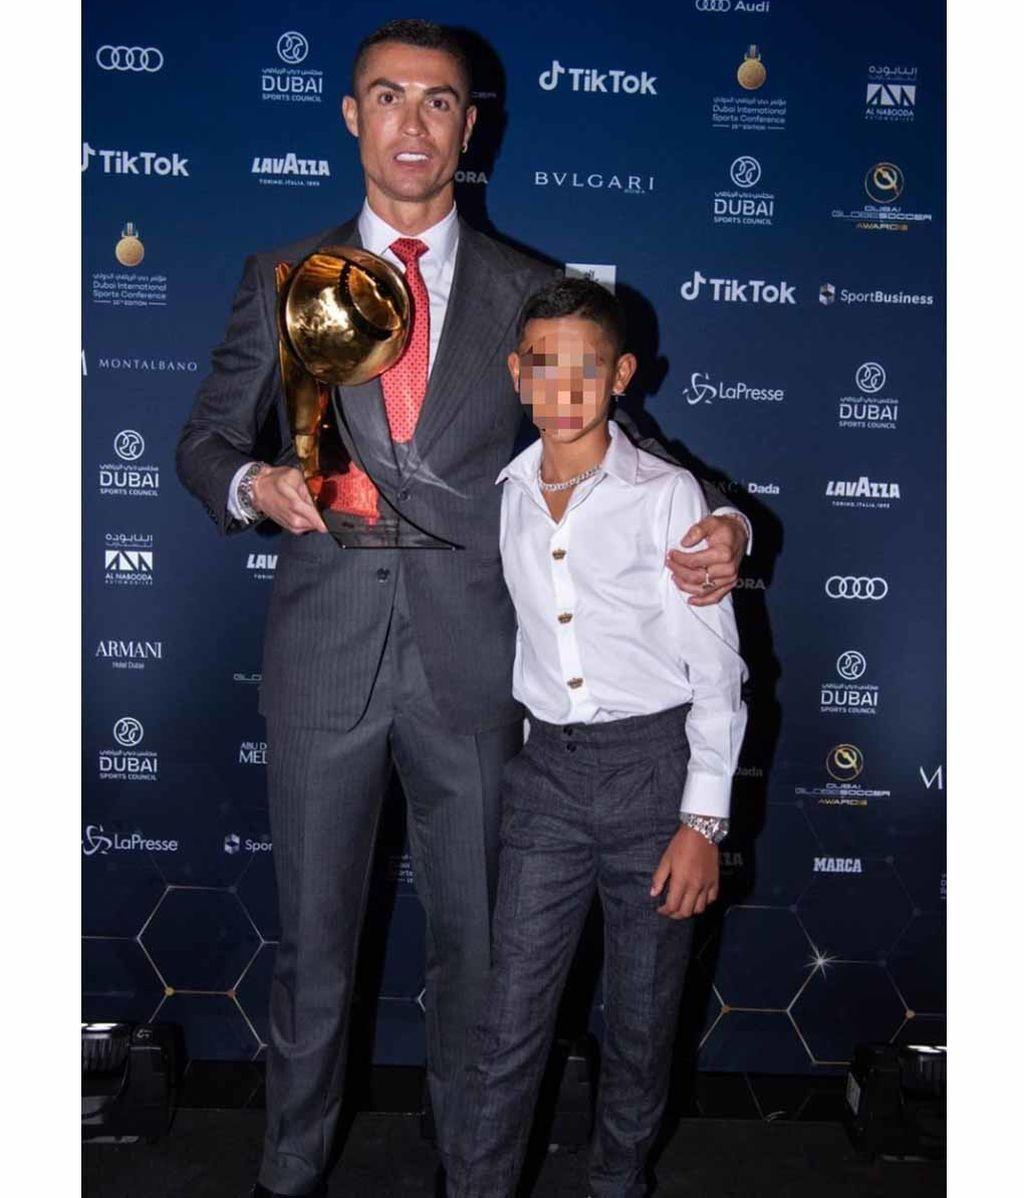 Cristiano Ronaldo estuvo apoyado en todo momento por su hijo